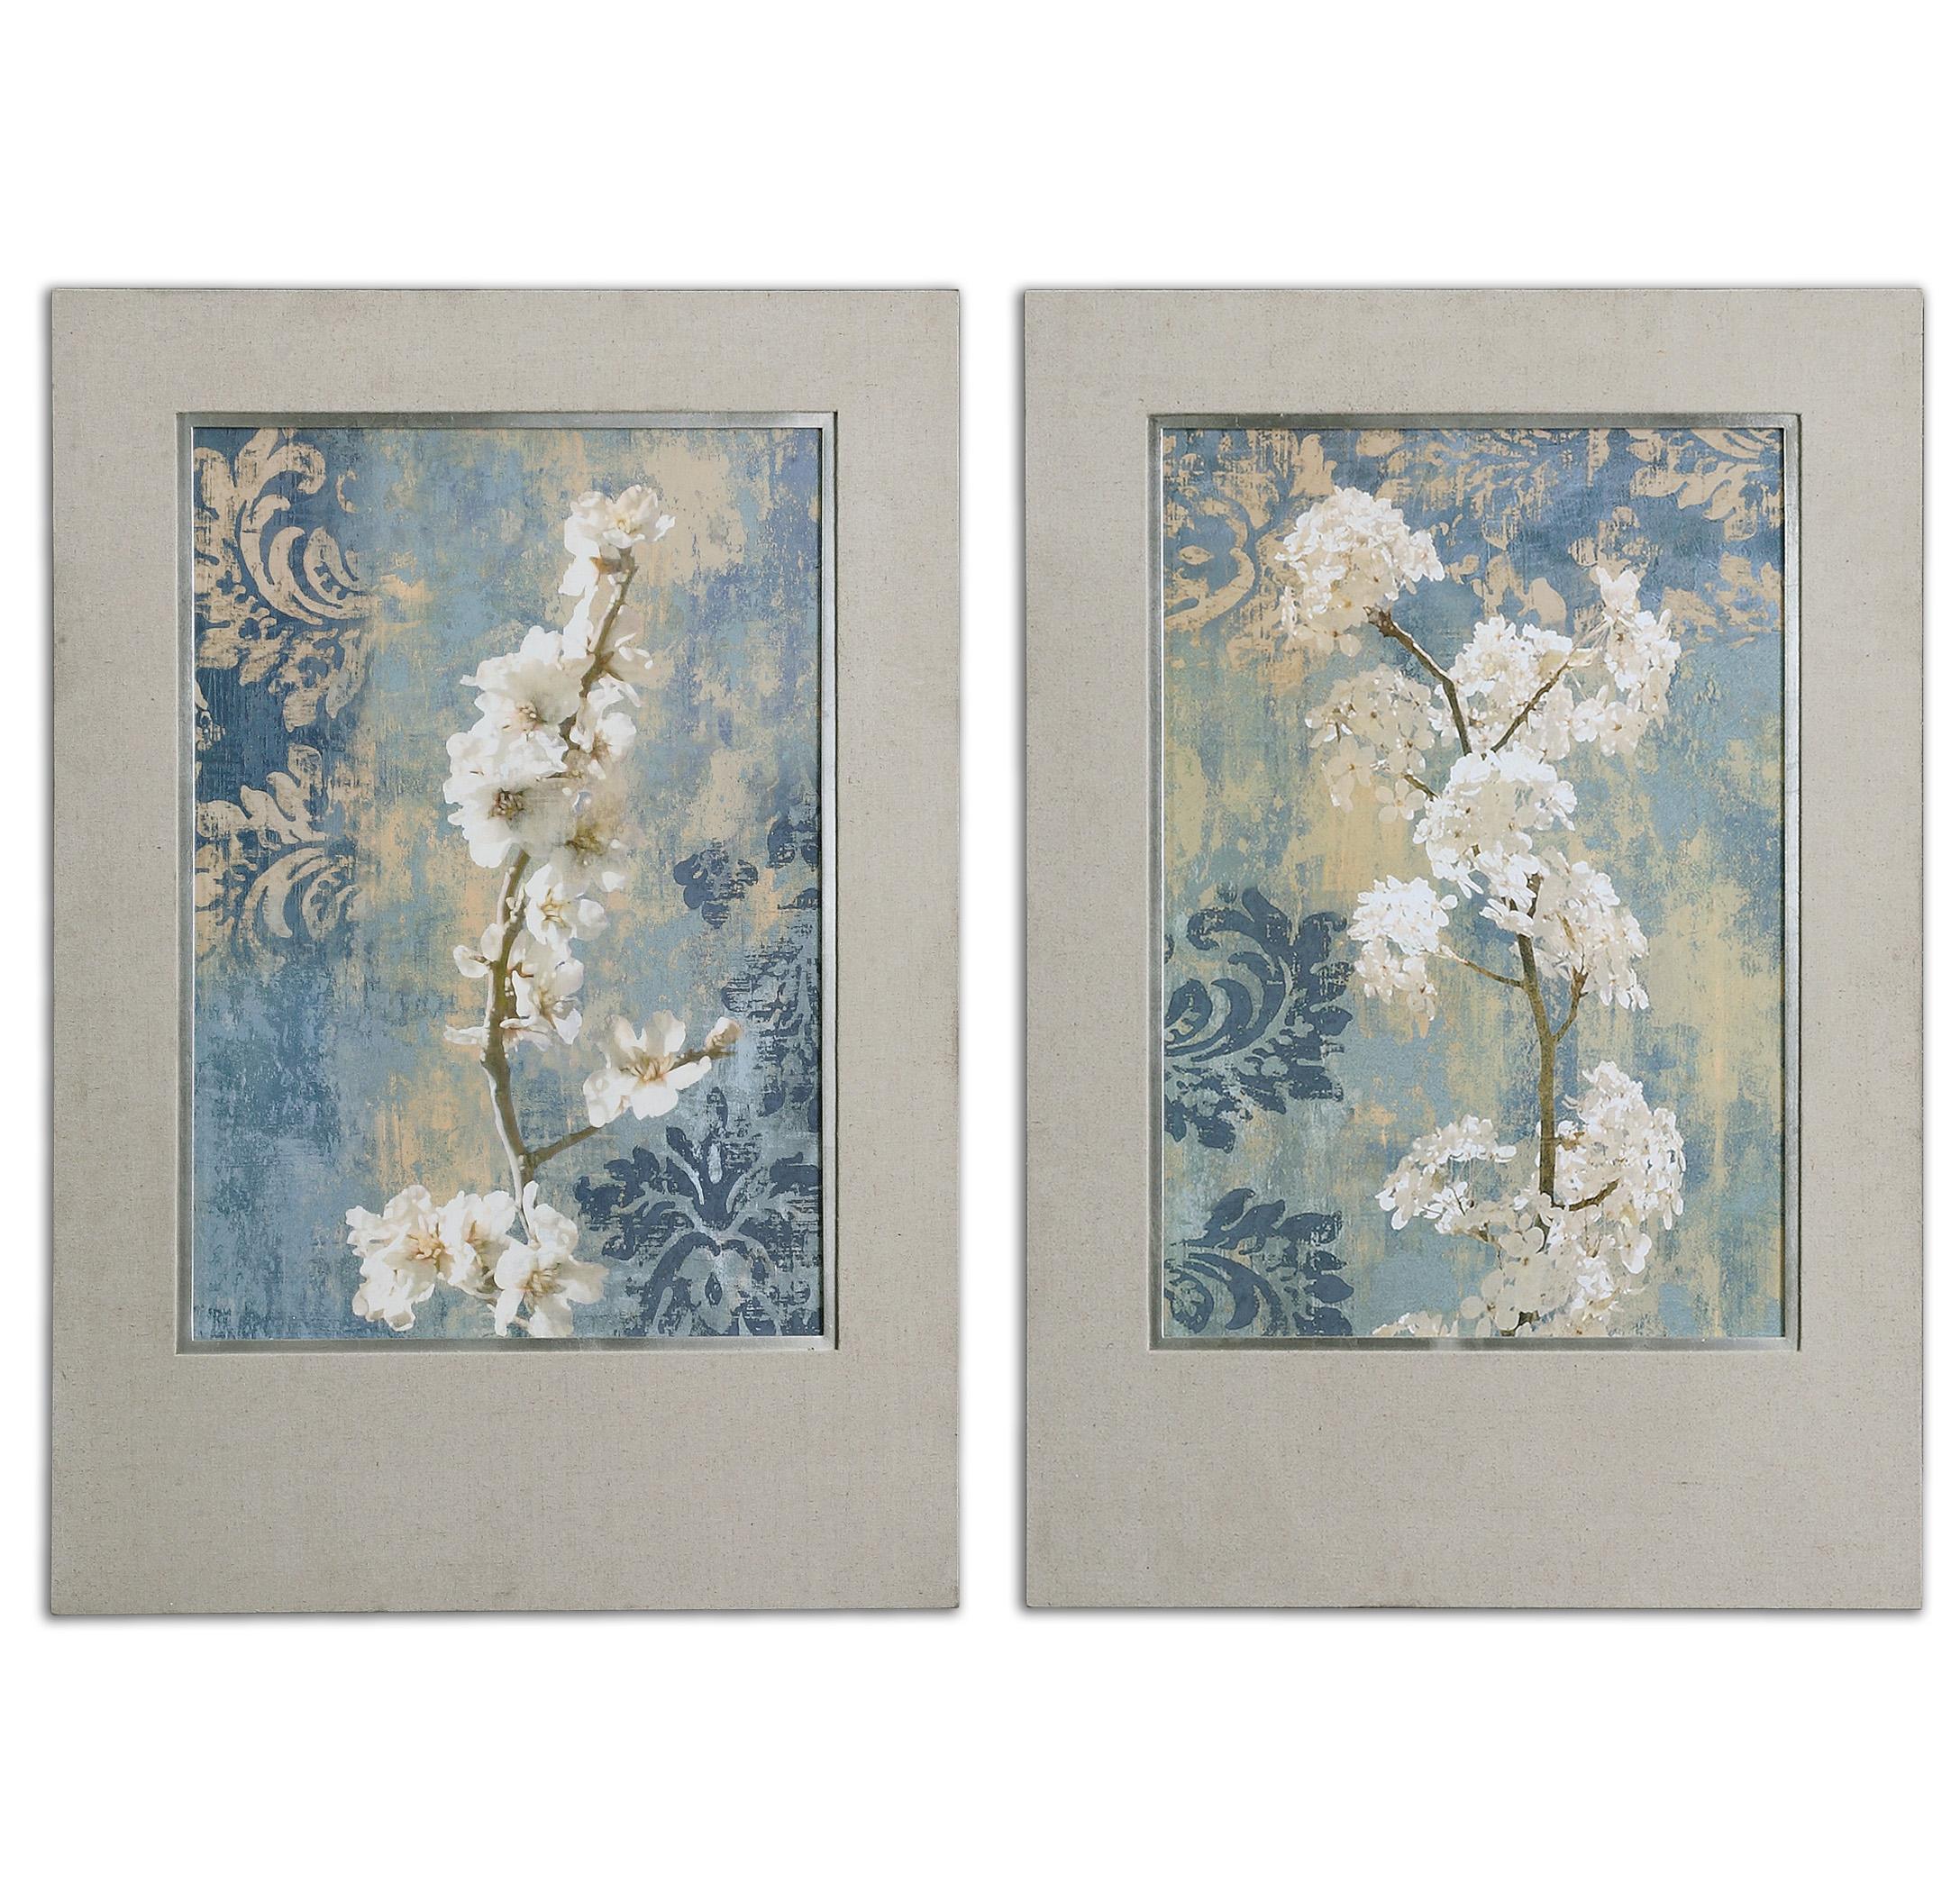 Uttermost Art Blossoms Framed Art Set of 2 - Item Number: 41511